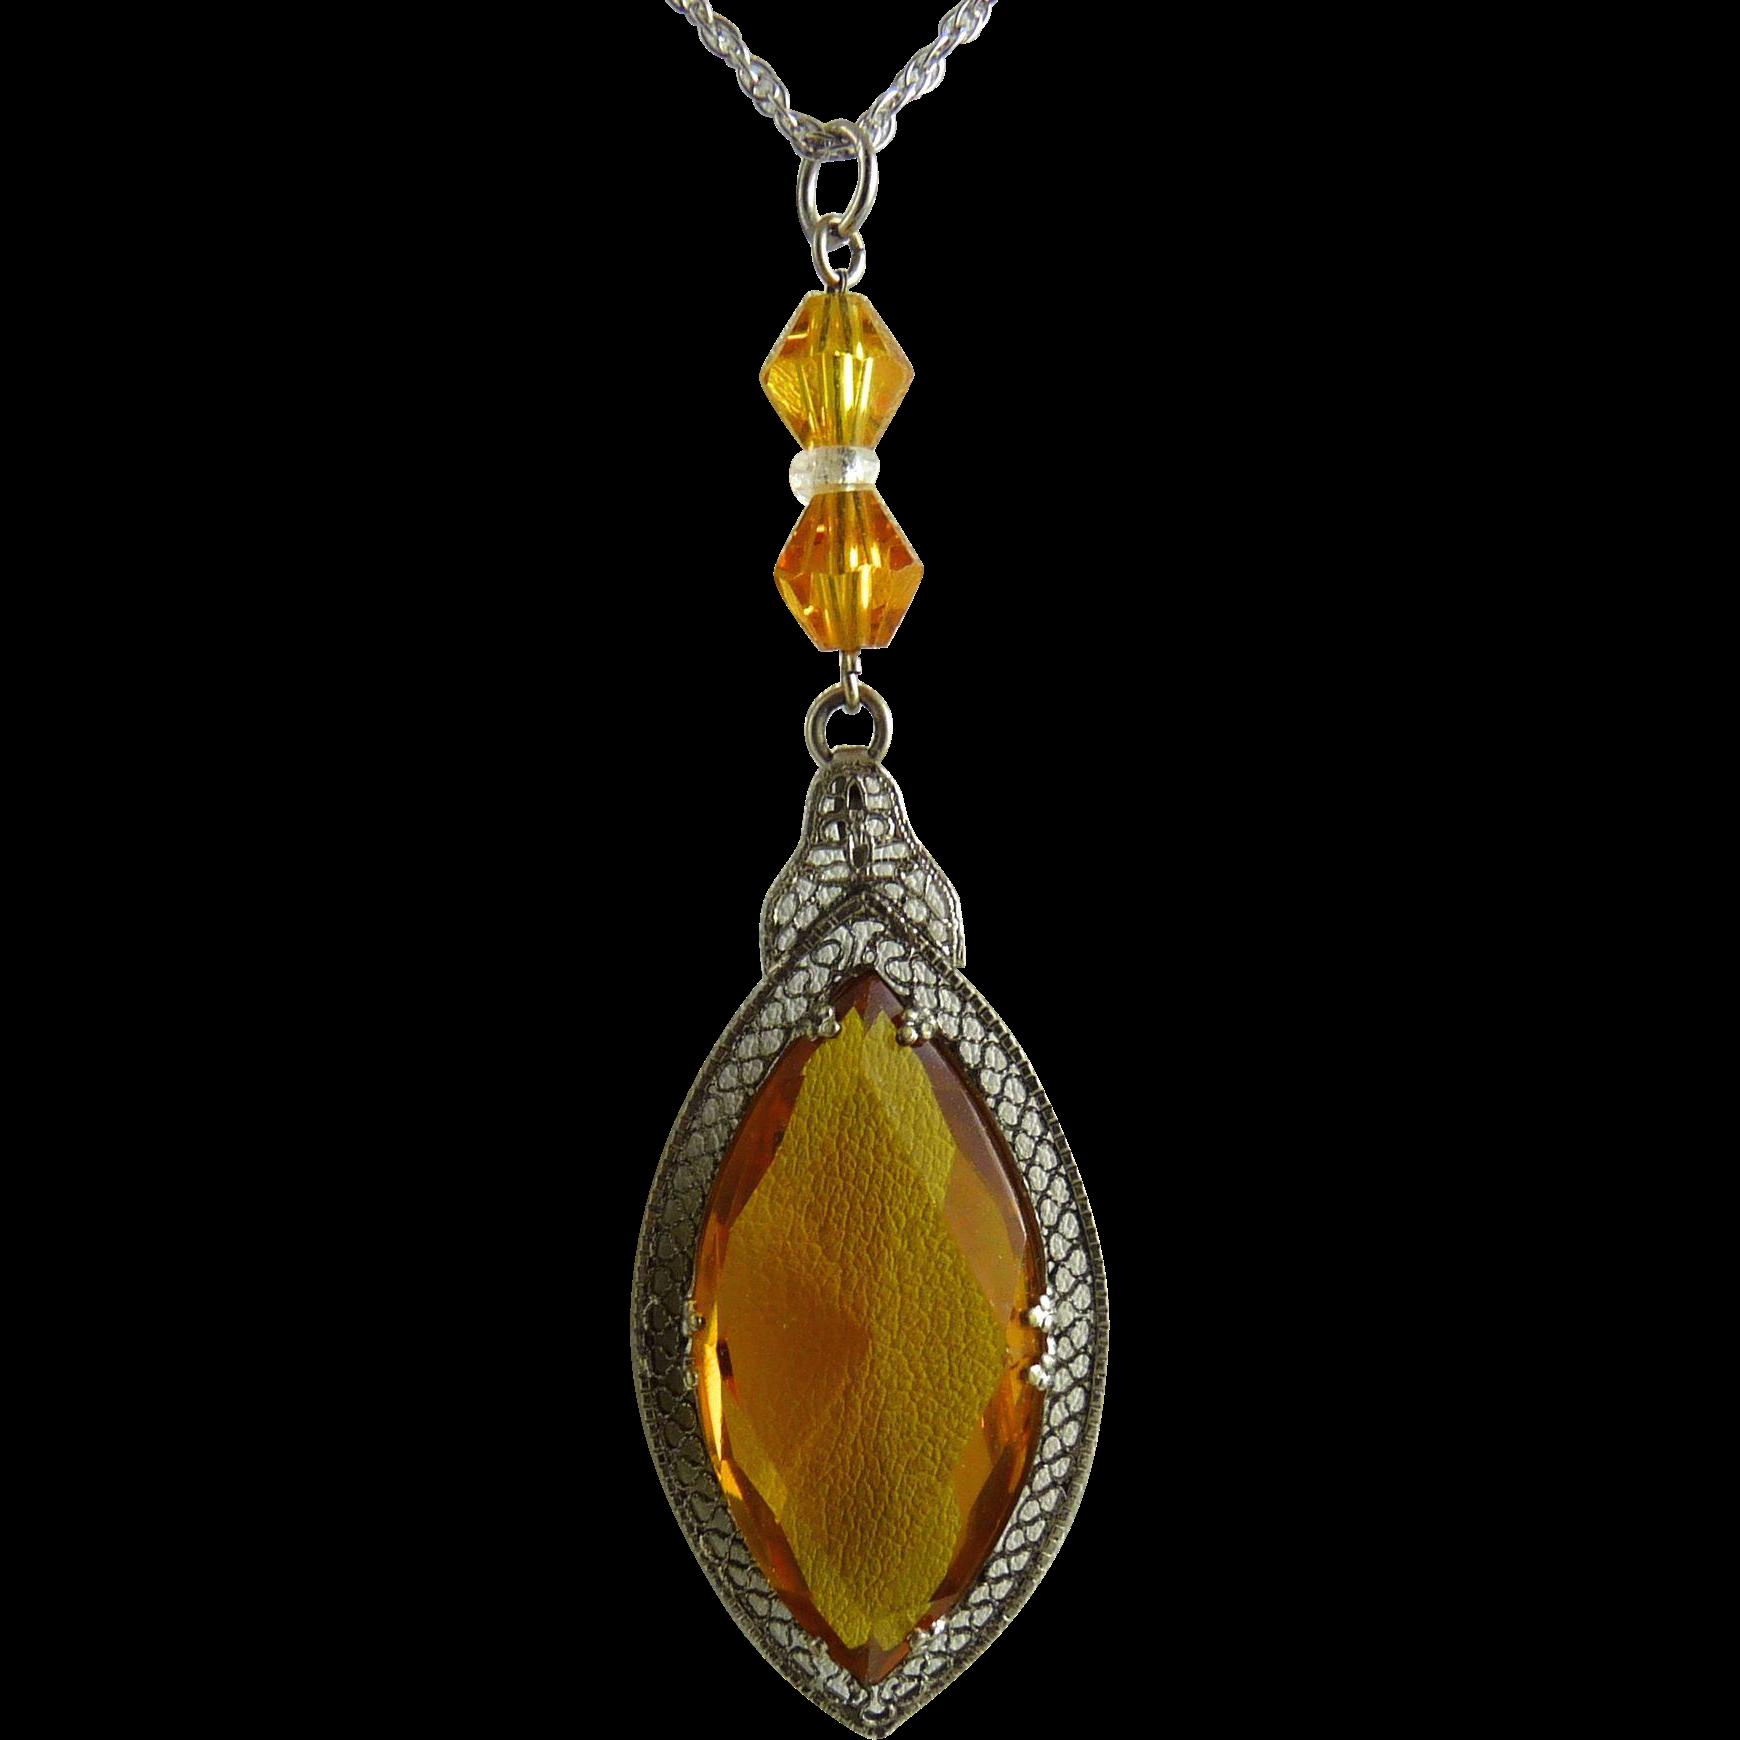 Vintage Art Deco Rhodium Filigree Pendant with Amber Glass Stone